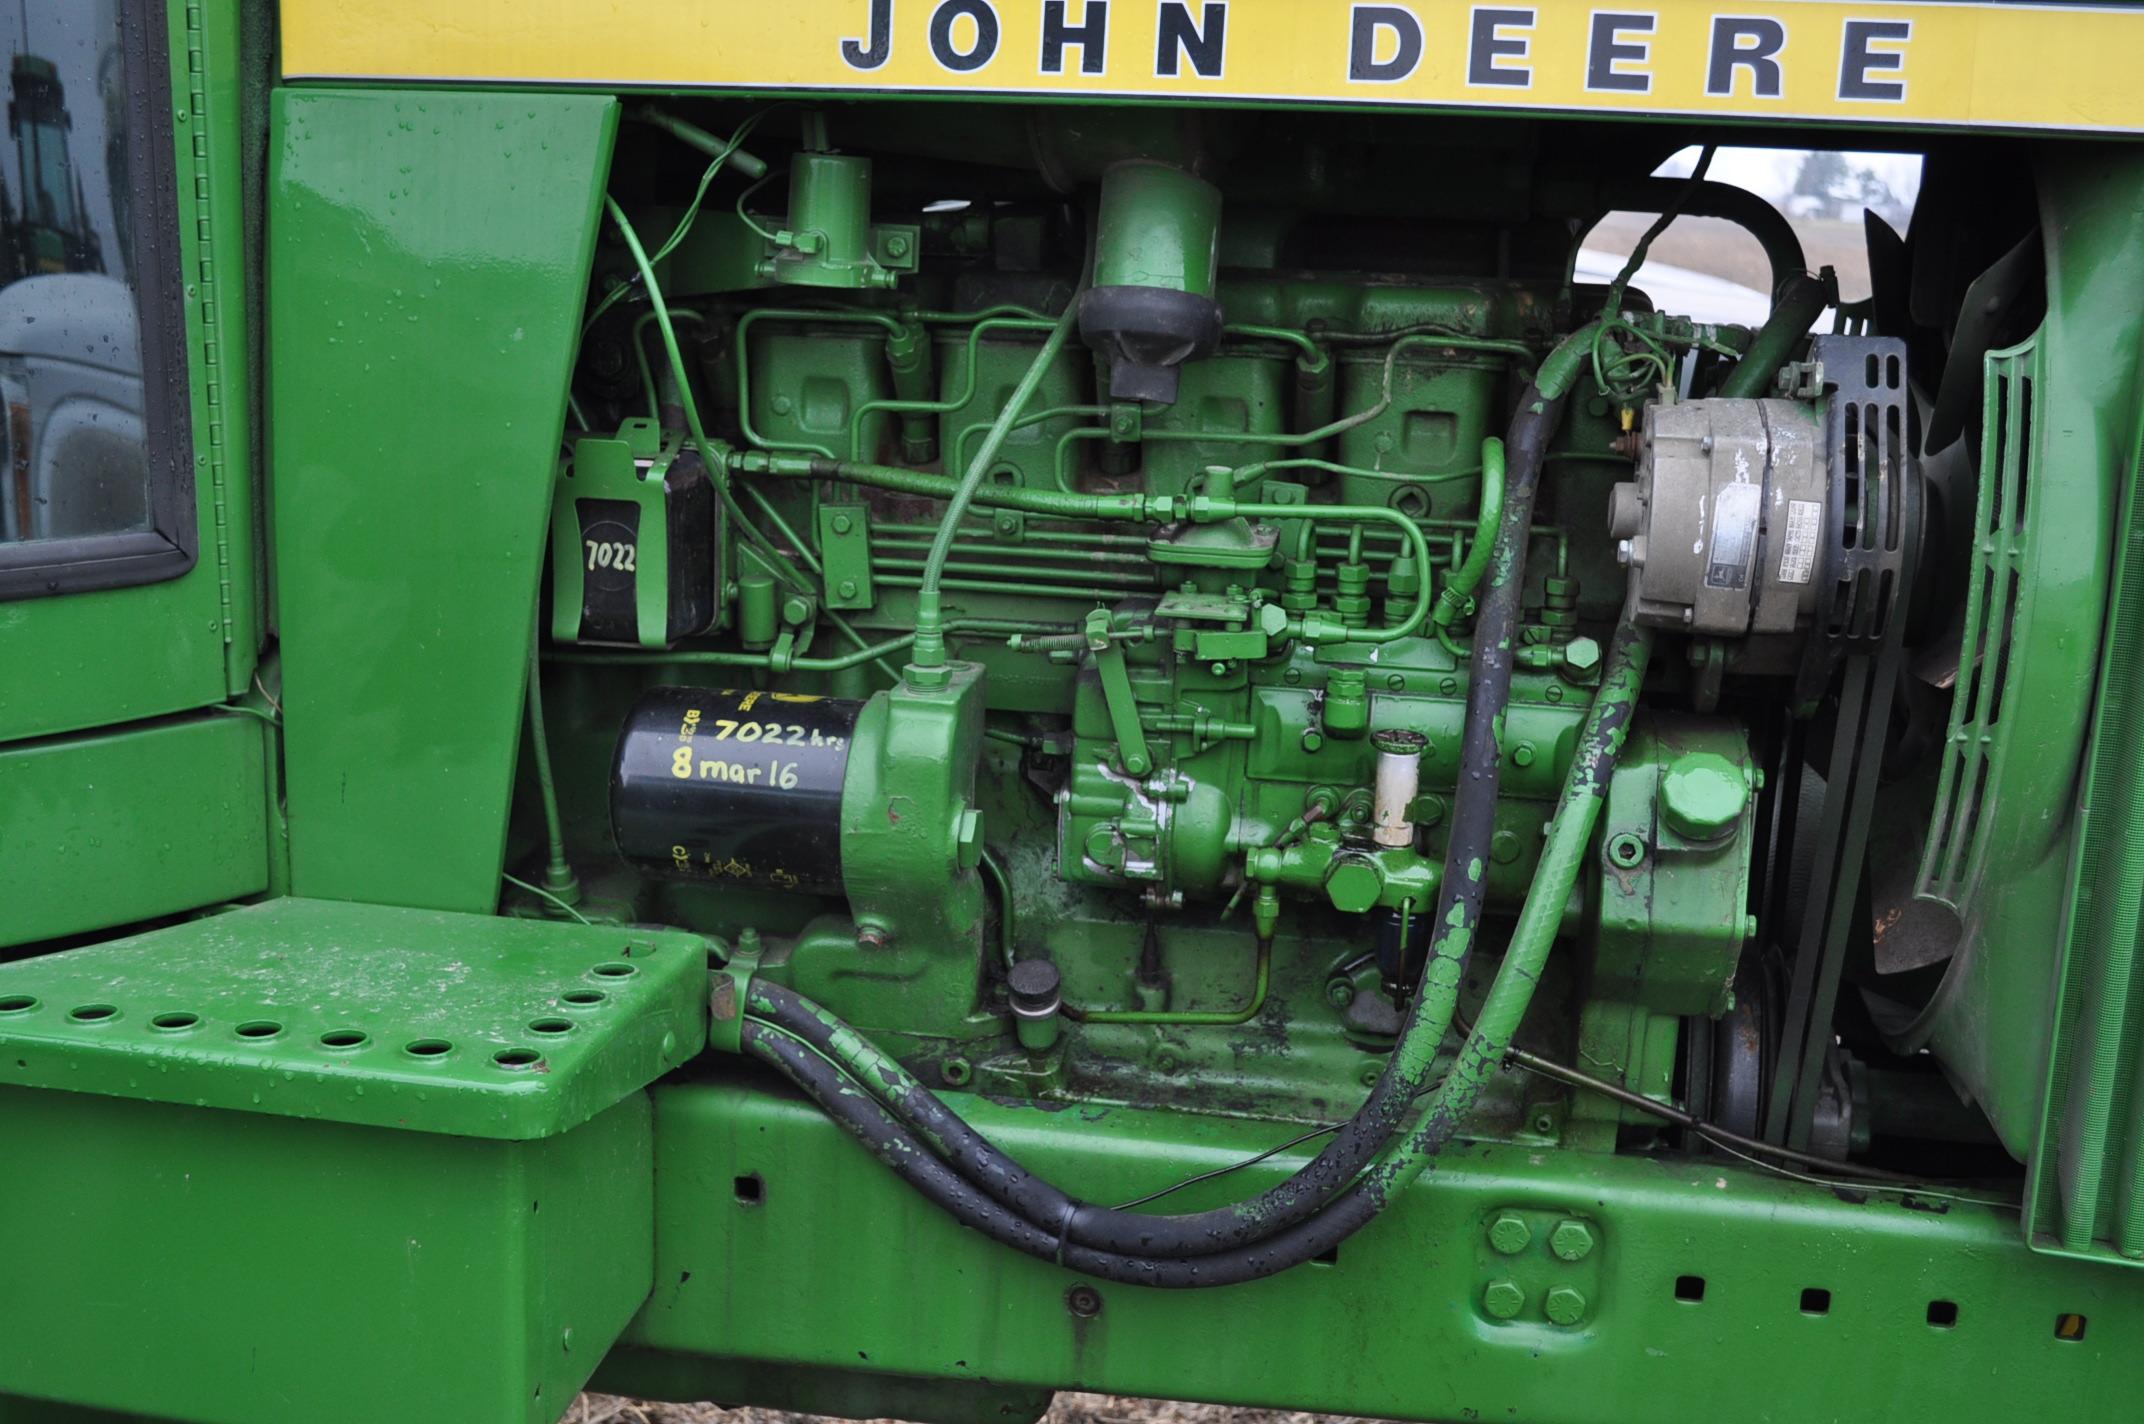 John Deere 4630 tractor, diesel, 20.8-38 hub duals, 14L-16 front, CHA, Quad range, 2 hyd remotes, - Image 9 of 22